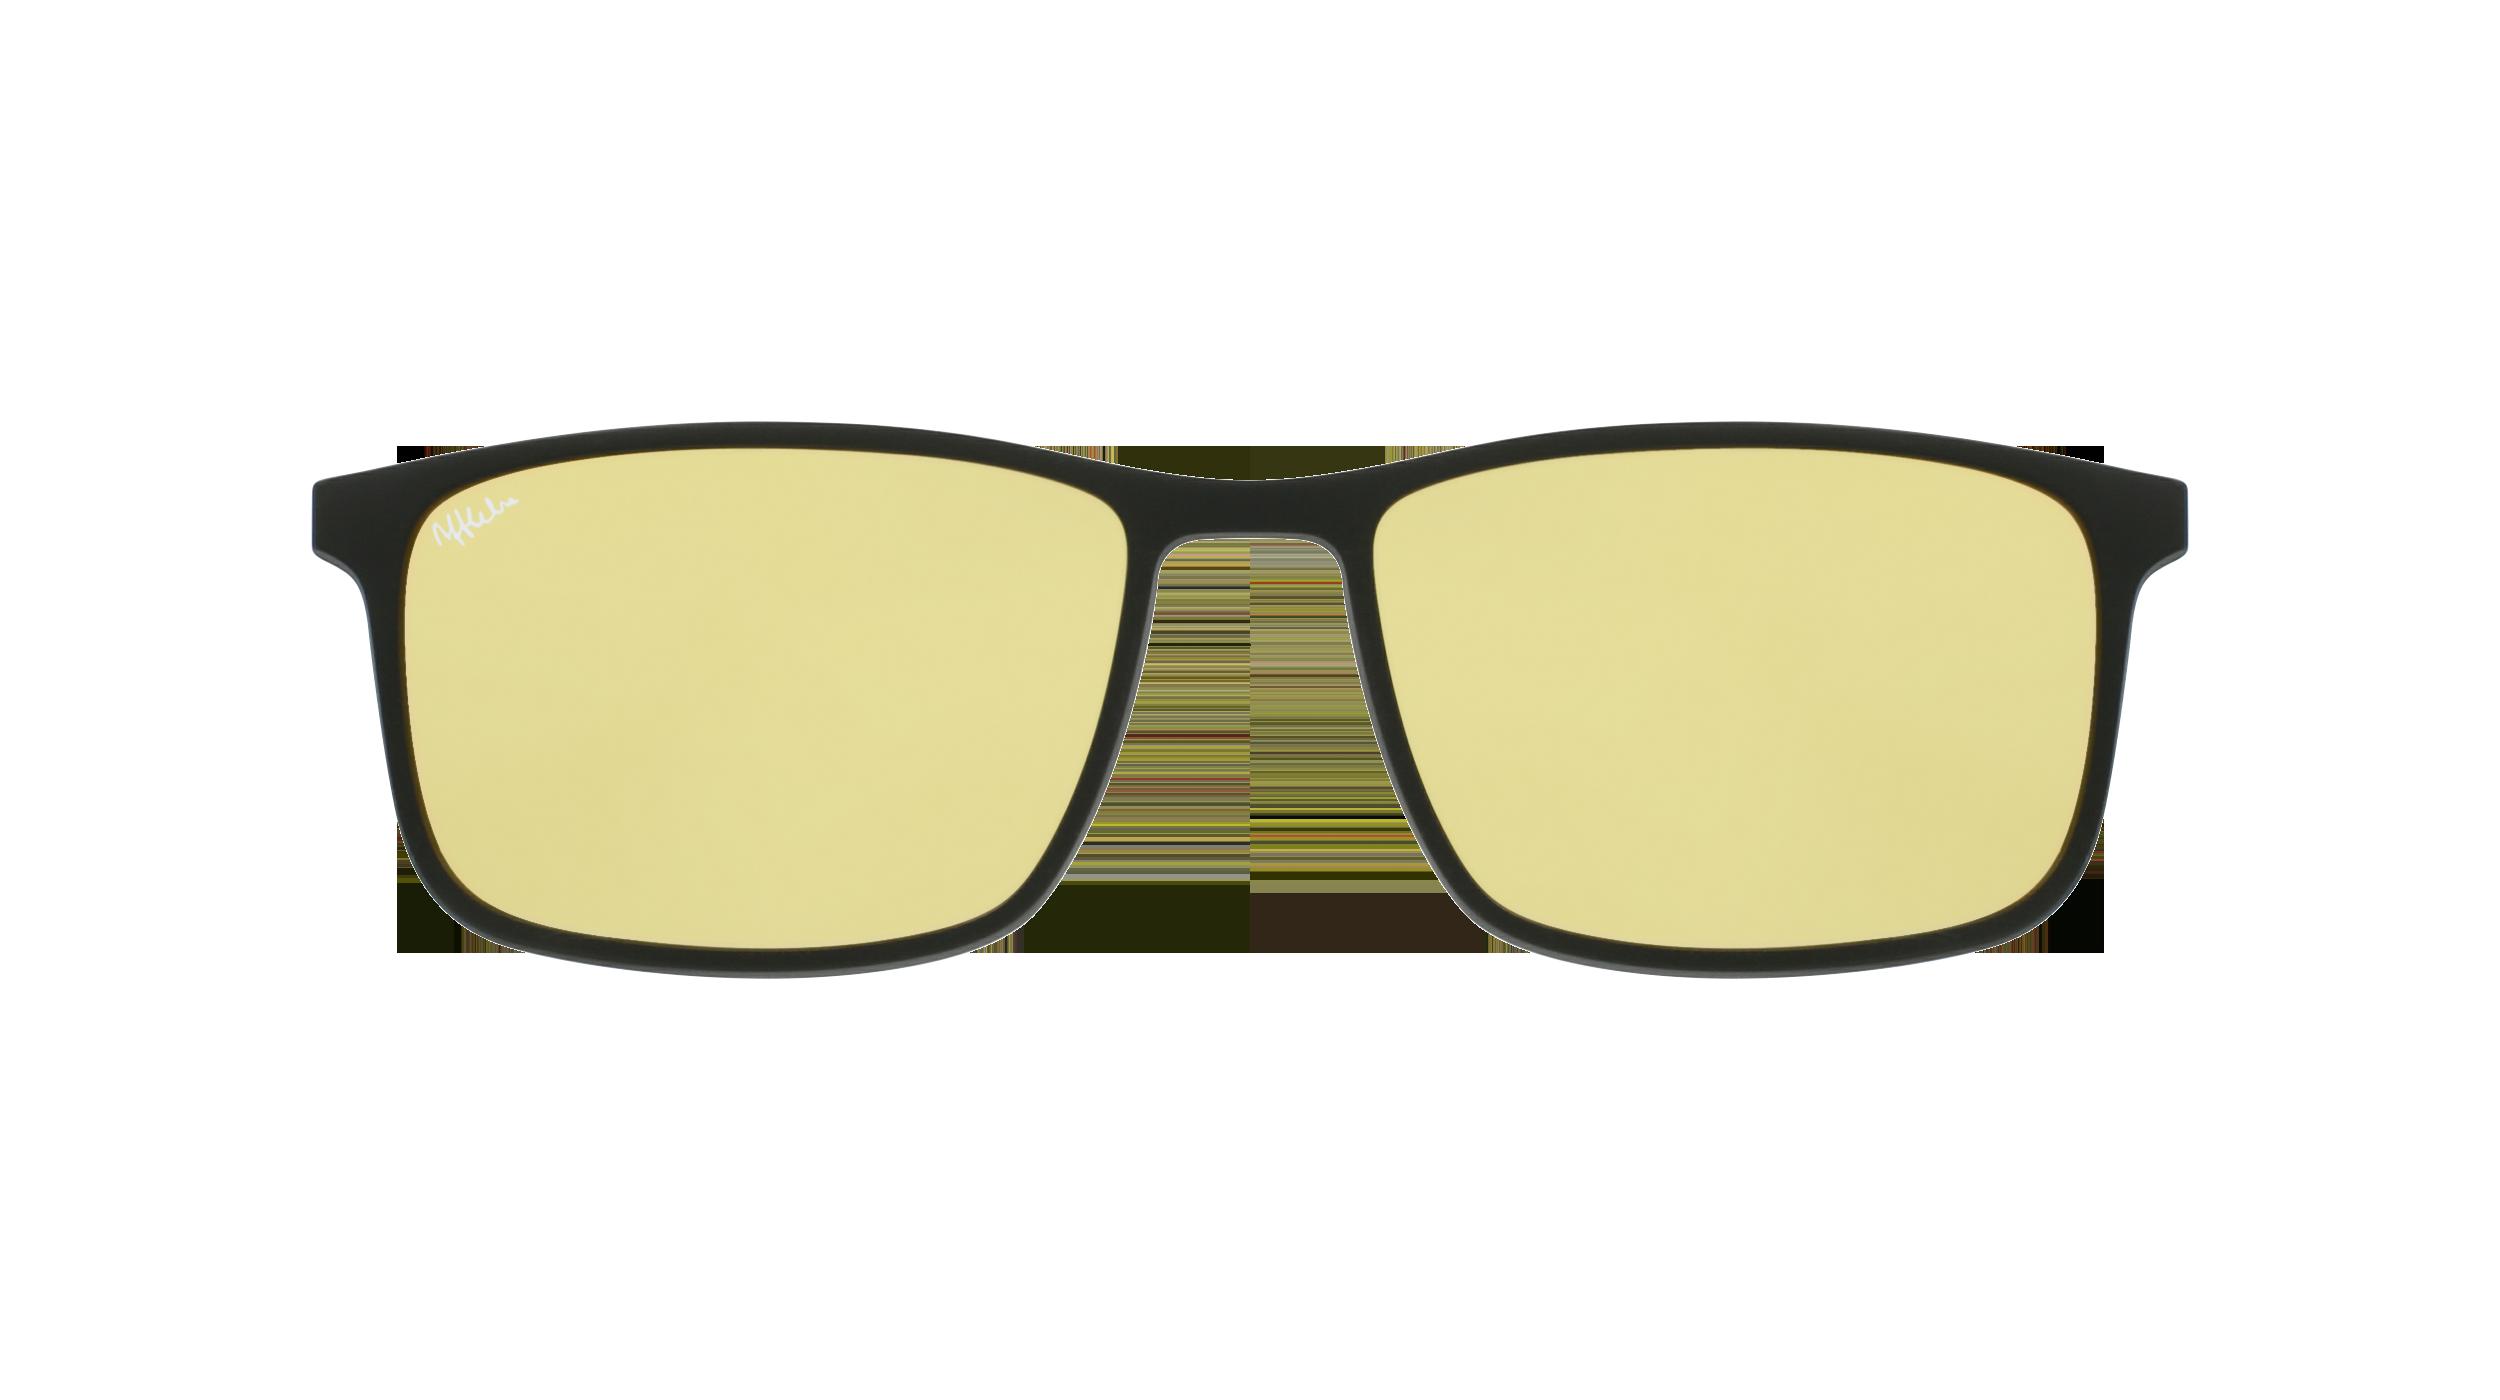 afflelou/france/products/smart_clip/clips_glasses/07630036458693.png